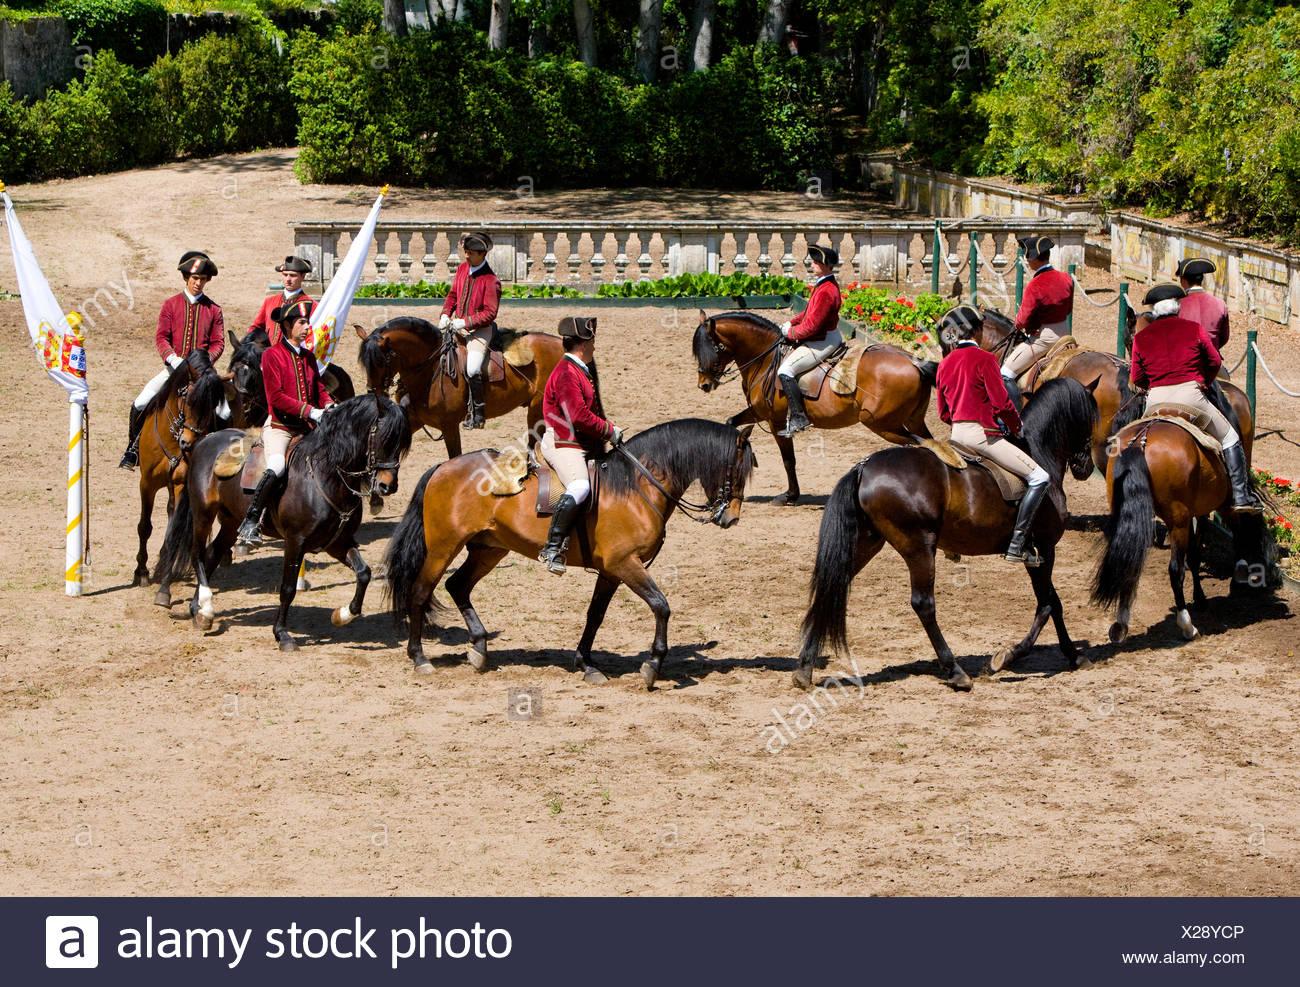 Riders of the Escola Portuguesa de Arte Equestre performing a quadrille. Queluz, Portugal. For editorial use only !. - Stock Image